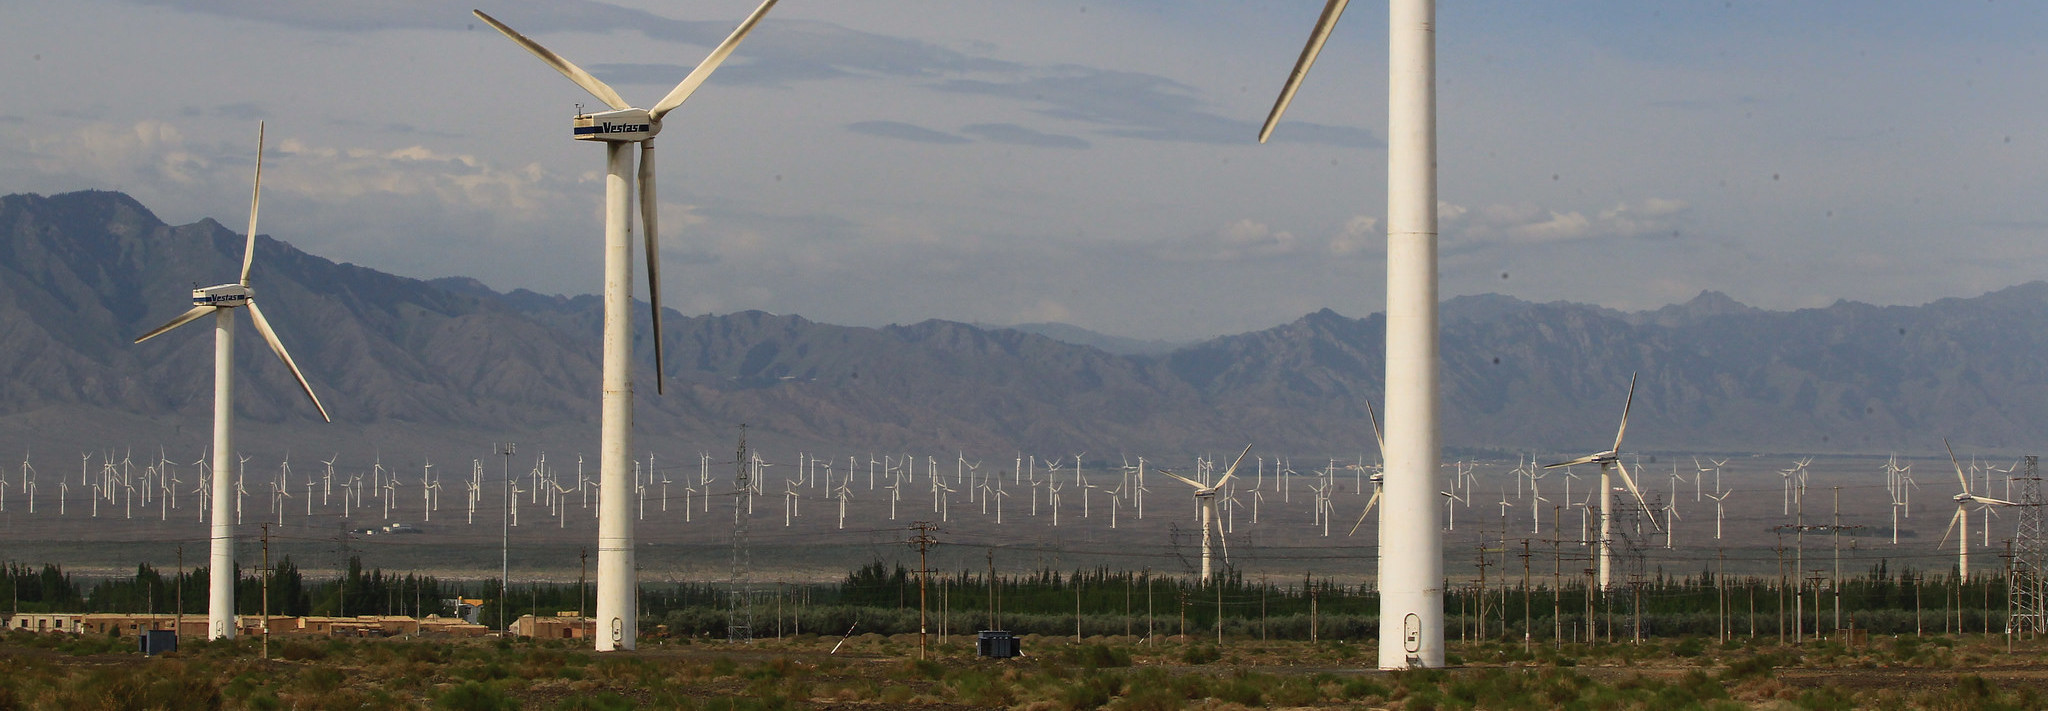 The Dabancheng Wind Farm, China (Photo: ADB/Flickr)